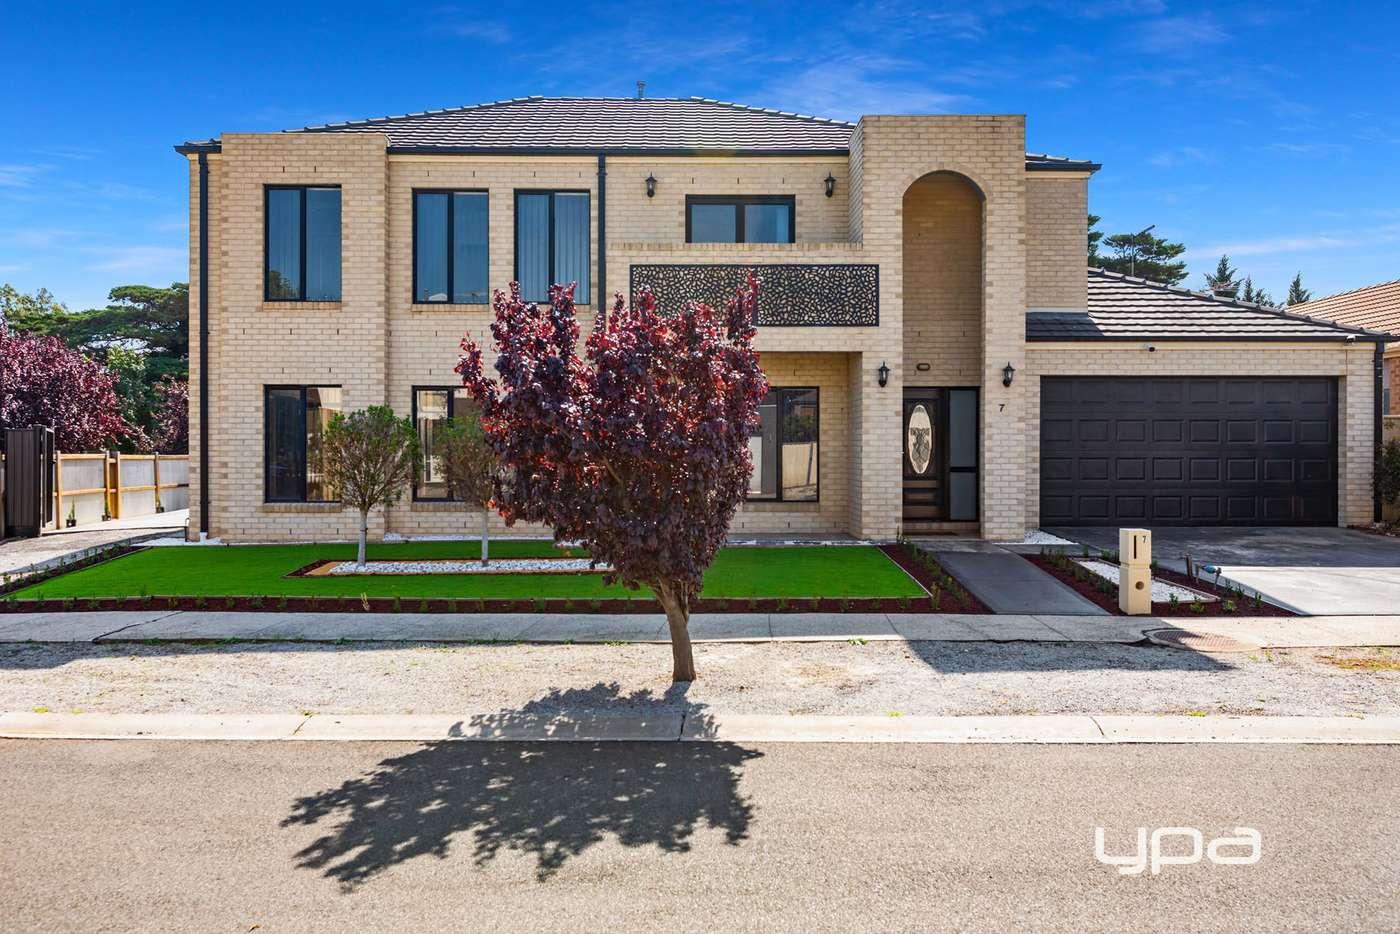 Main view of Homely house listing, 7 Deepdene Street, Caroline Springs VIC 3023